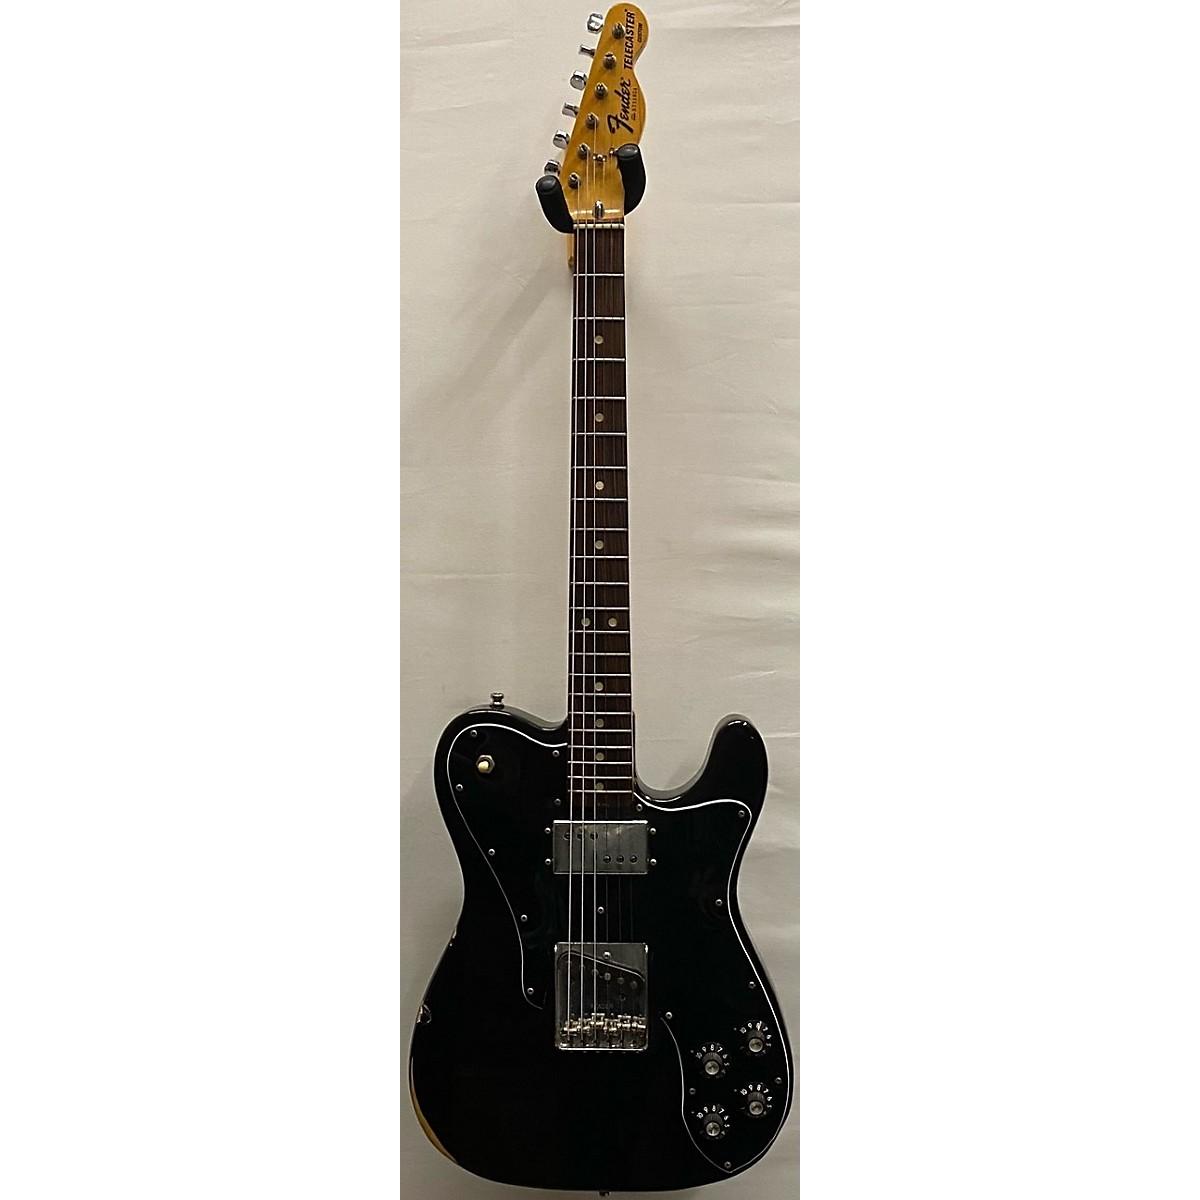 Fender 1977 Telecaster Custom Solid Body Electric Guitar